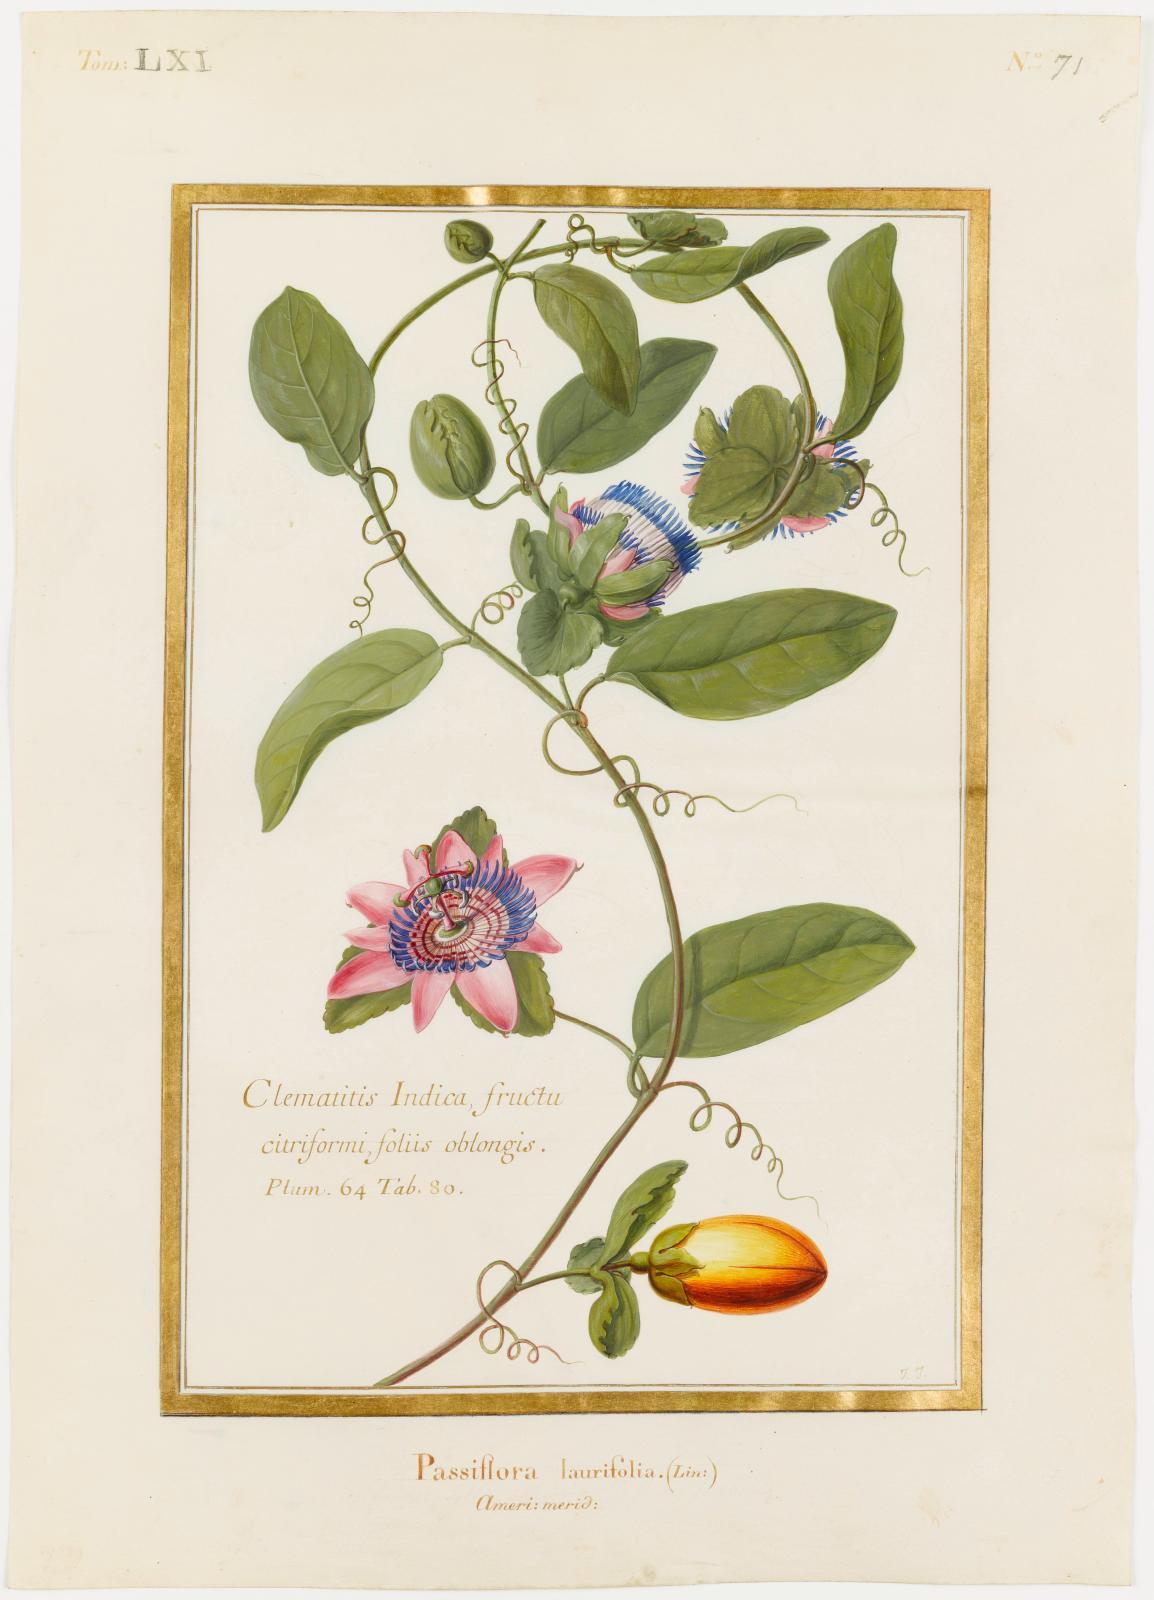 Passiflora laurifolia Linné (Passifloracées), Jean Joubert, Clematitis Indica, fructu citriformi, foliis oblongis, Plum64 tab80, Passiflora laurifol